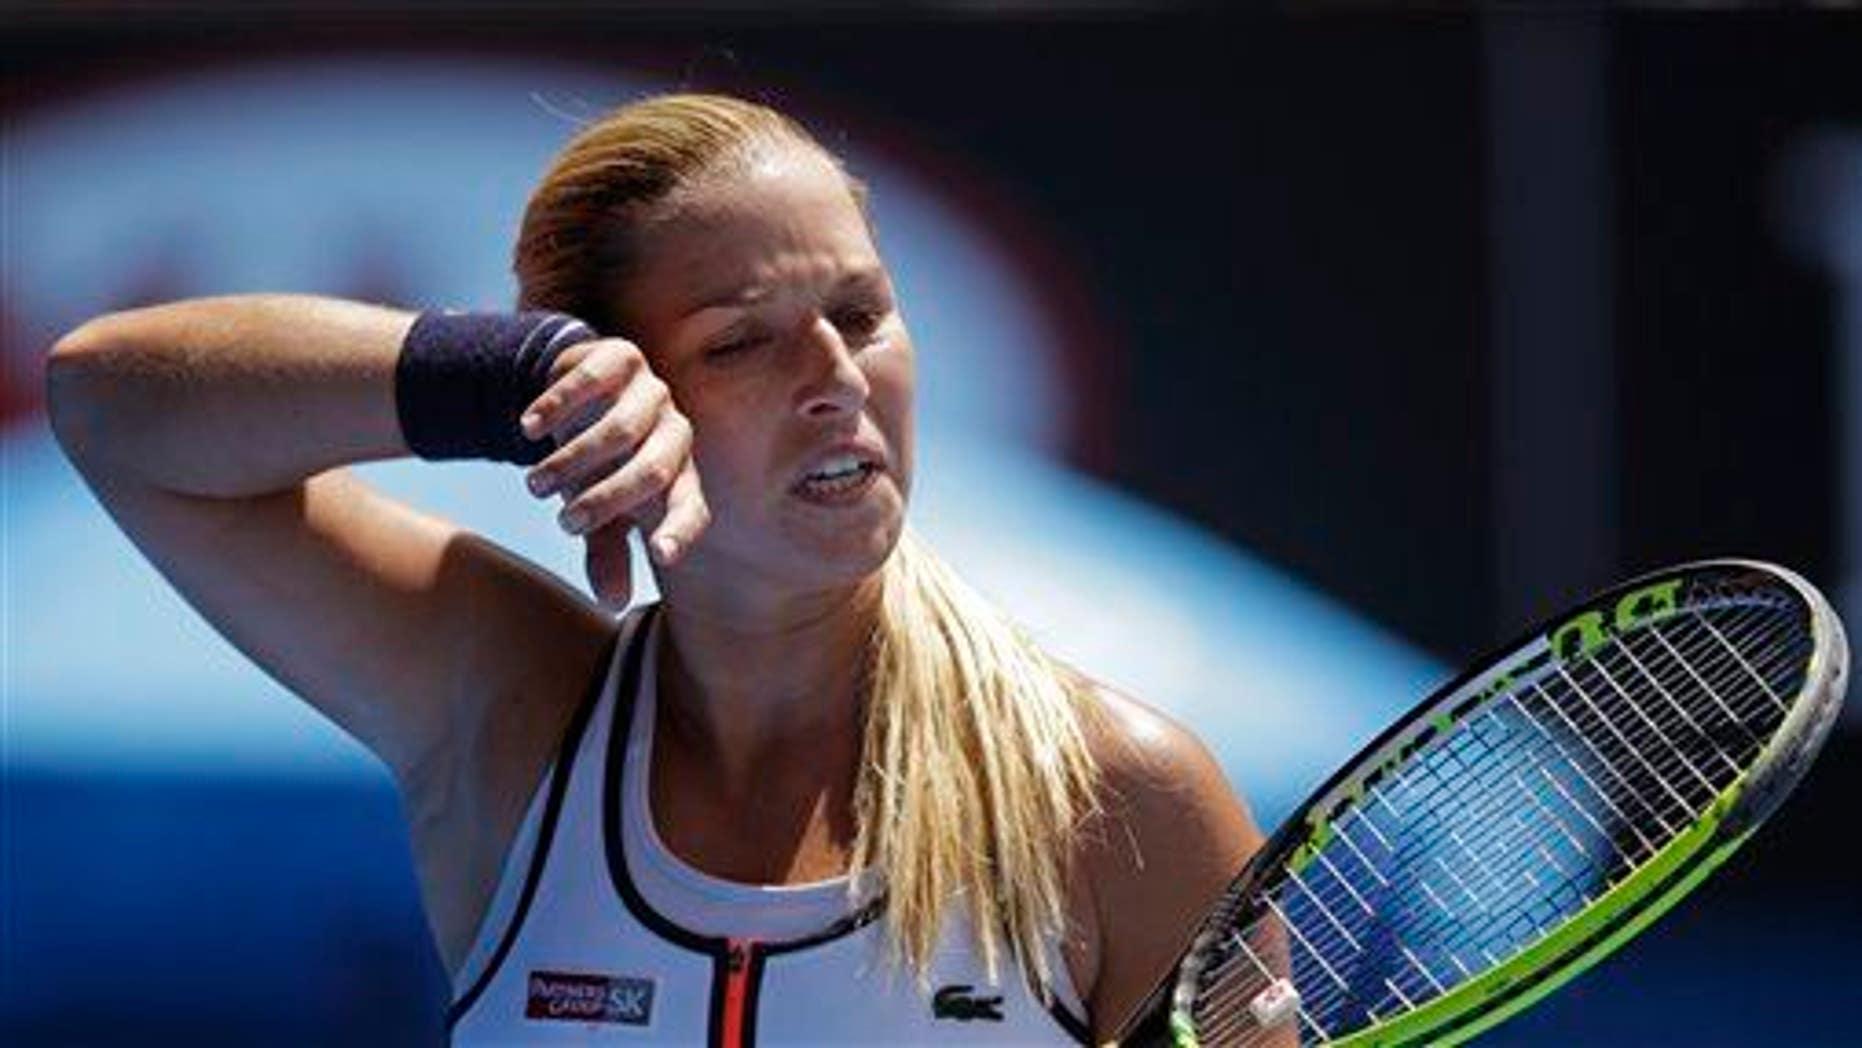 Dominika Cibulkova of Slovakia wipes the sweat from the face as she plays Serena Williams at the Australian Open this year.